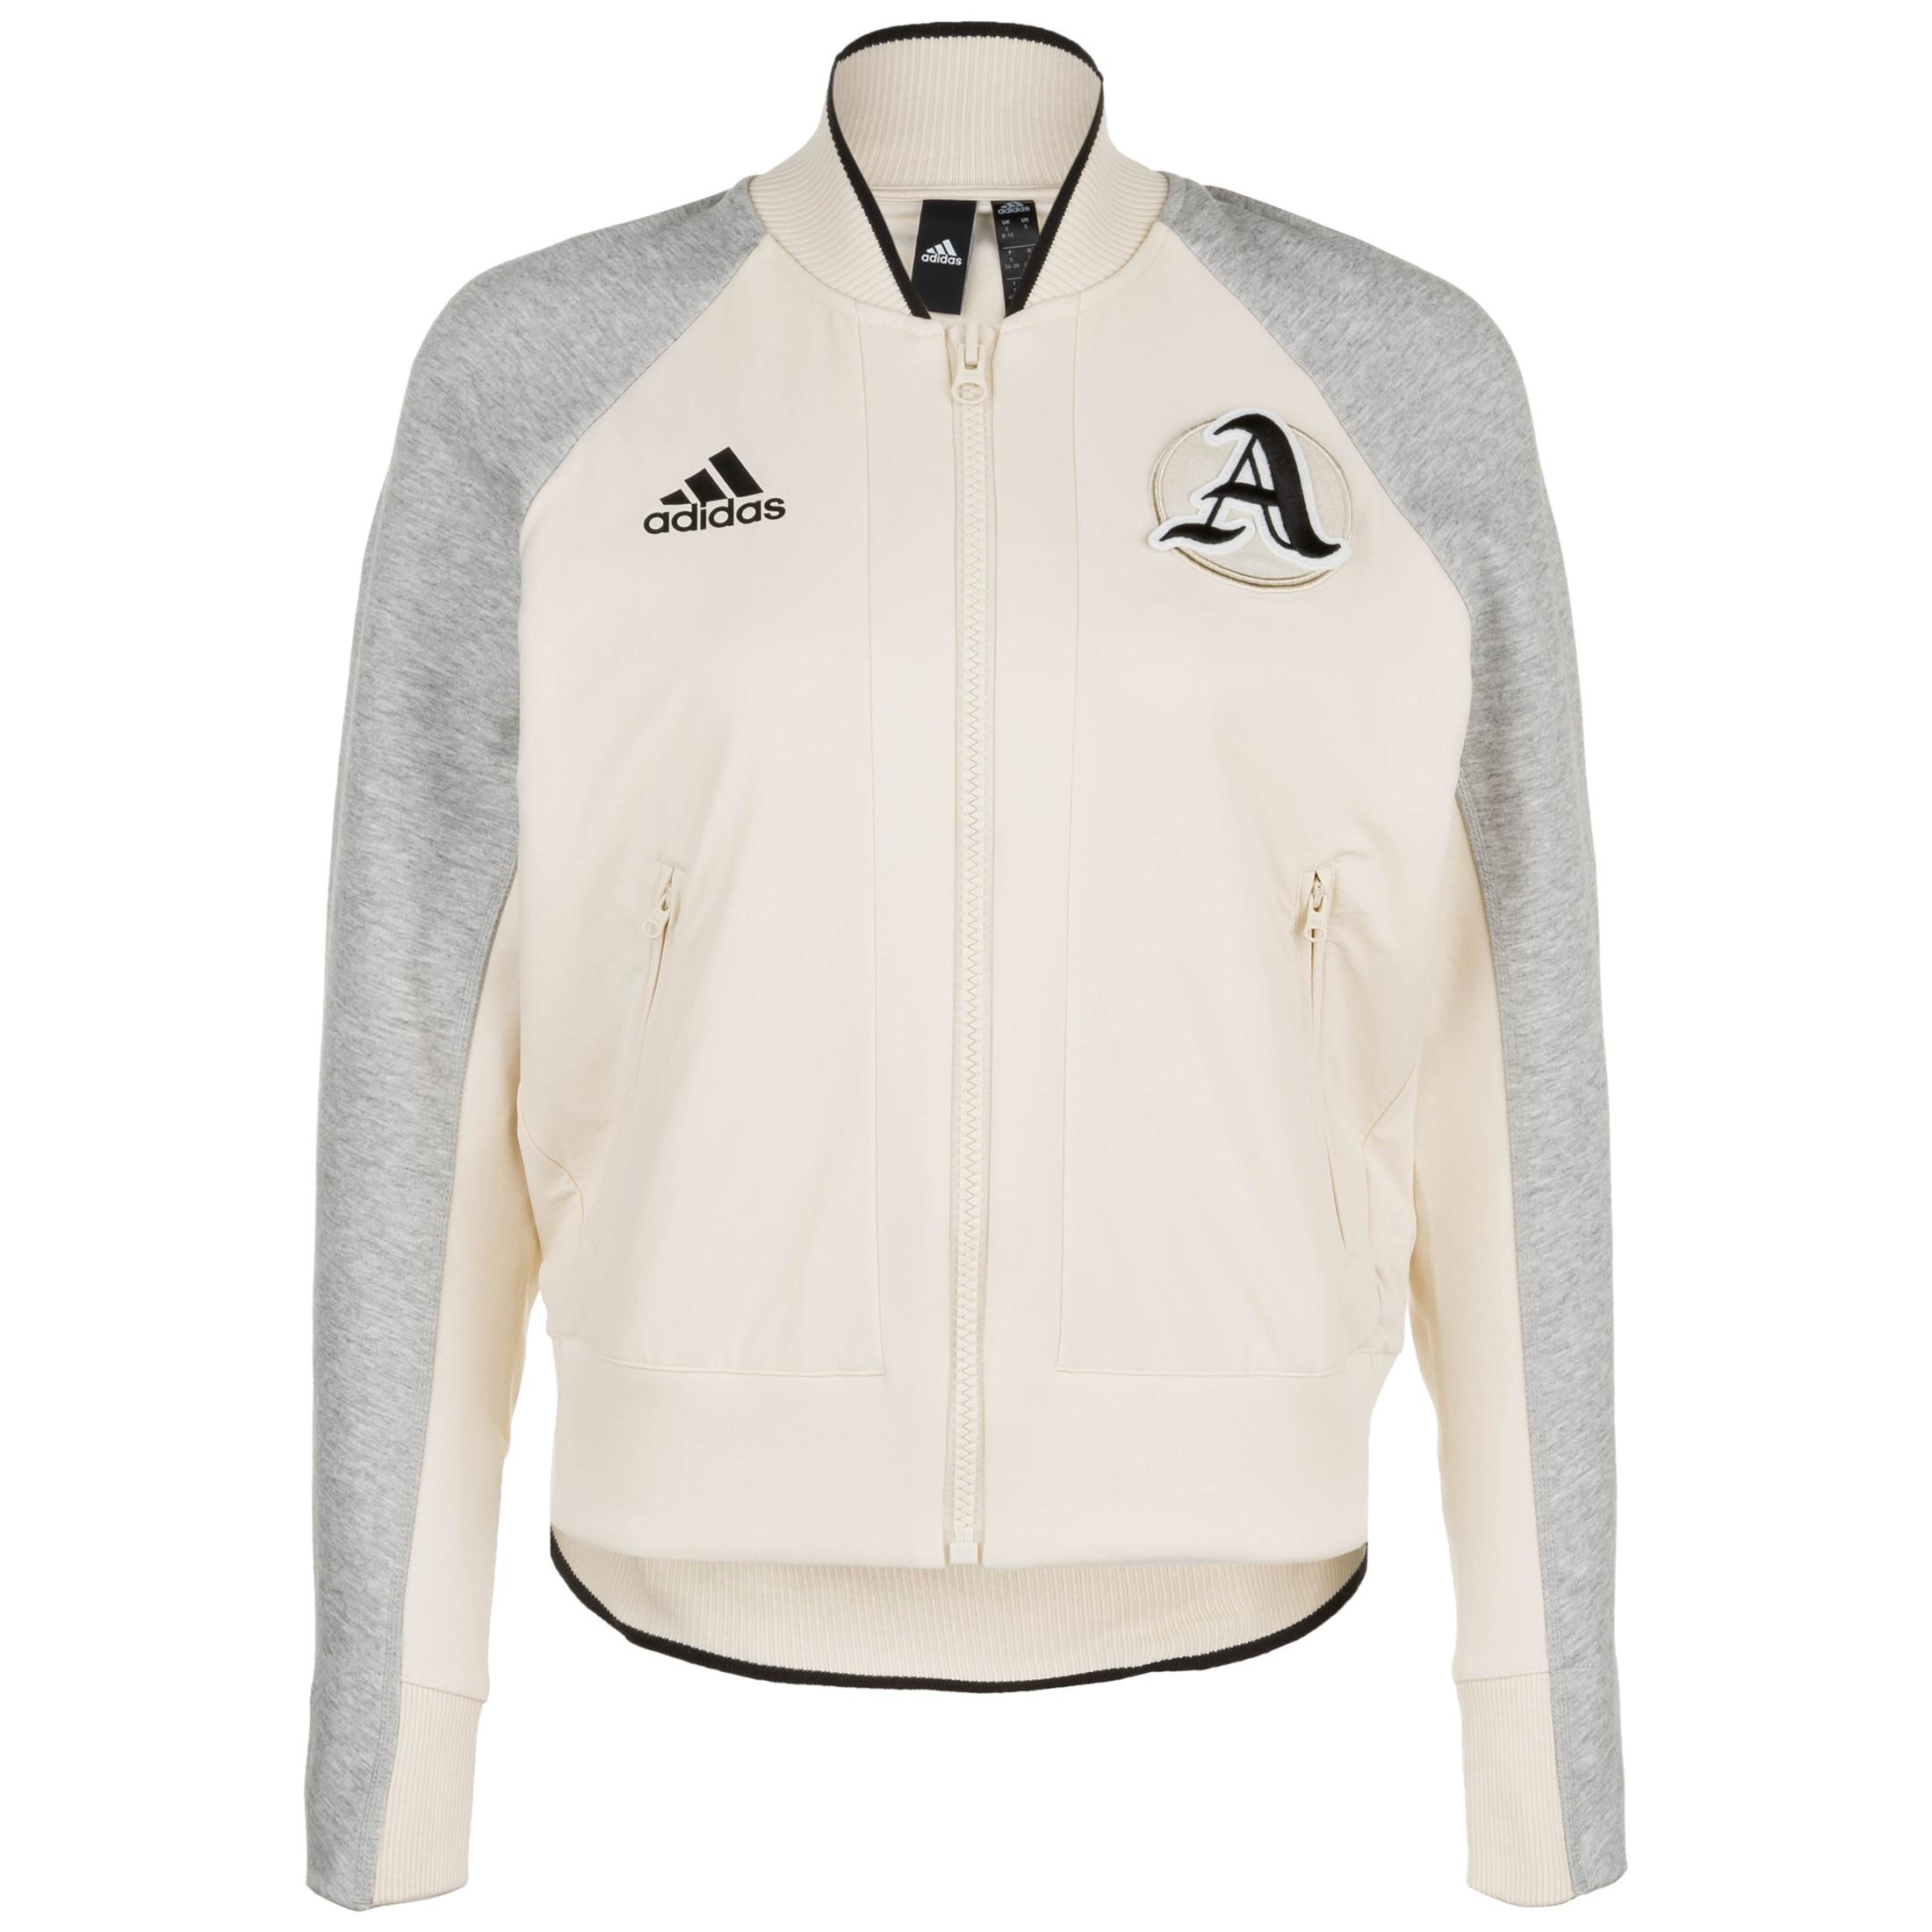 adidas Performance Sweatjacke Vrct   Bekleidung > Sweatshirts & -jacken > Sweatjacken   Adidas Performance